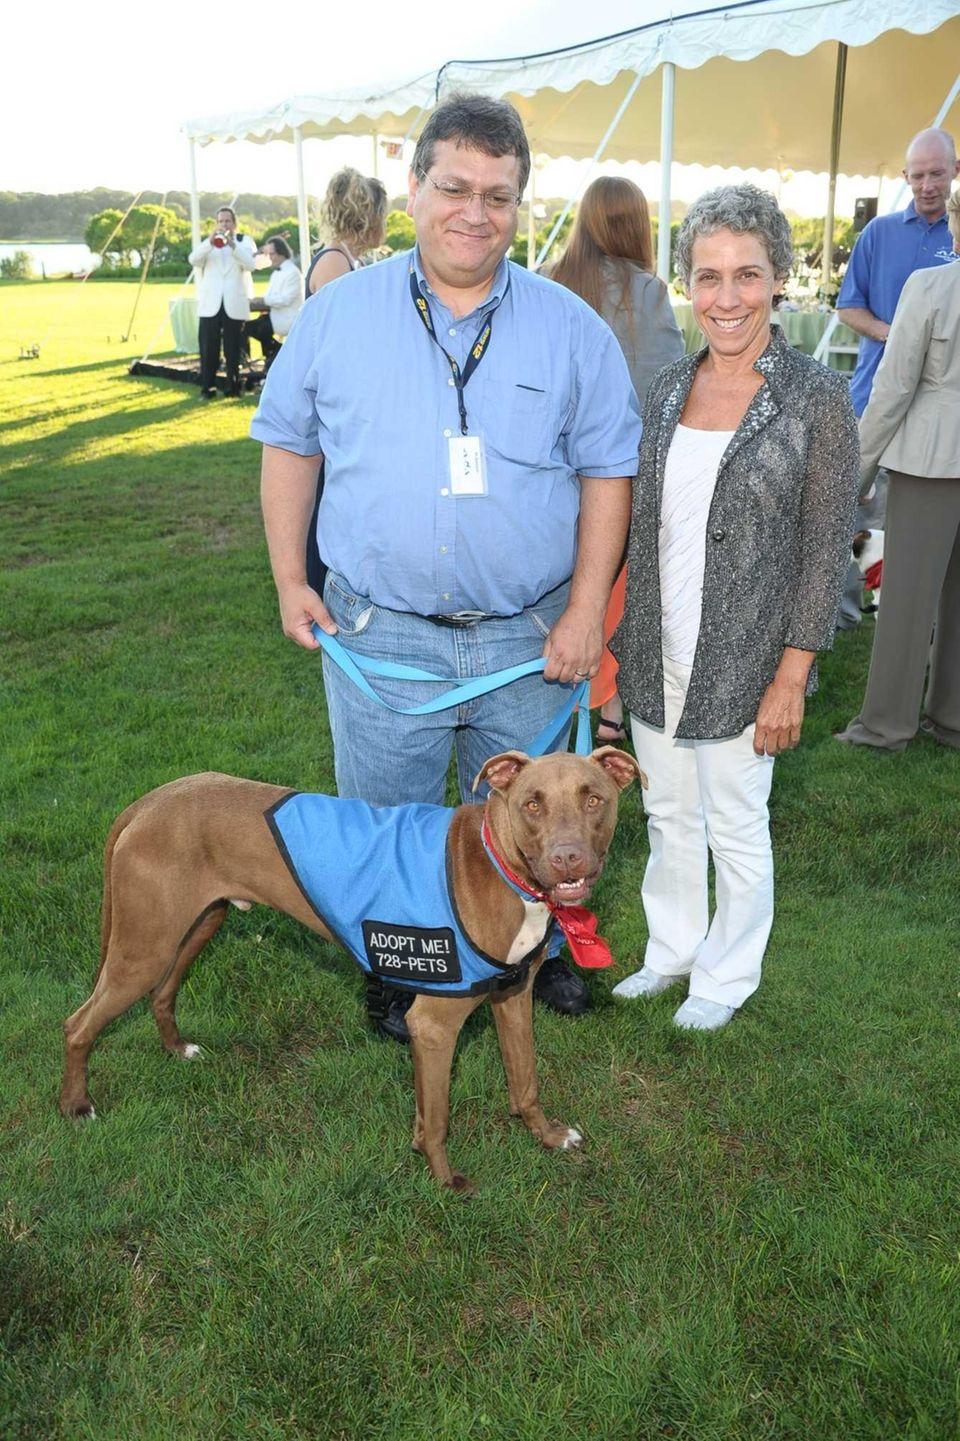 Mark Ambrico, Smokey the dog and Dorothy Frankel